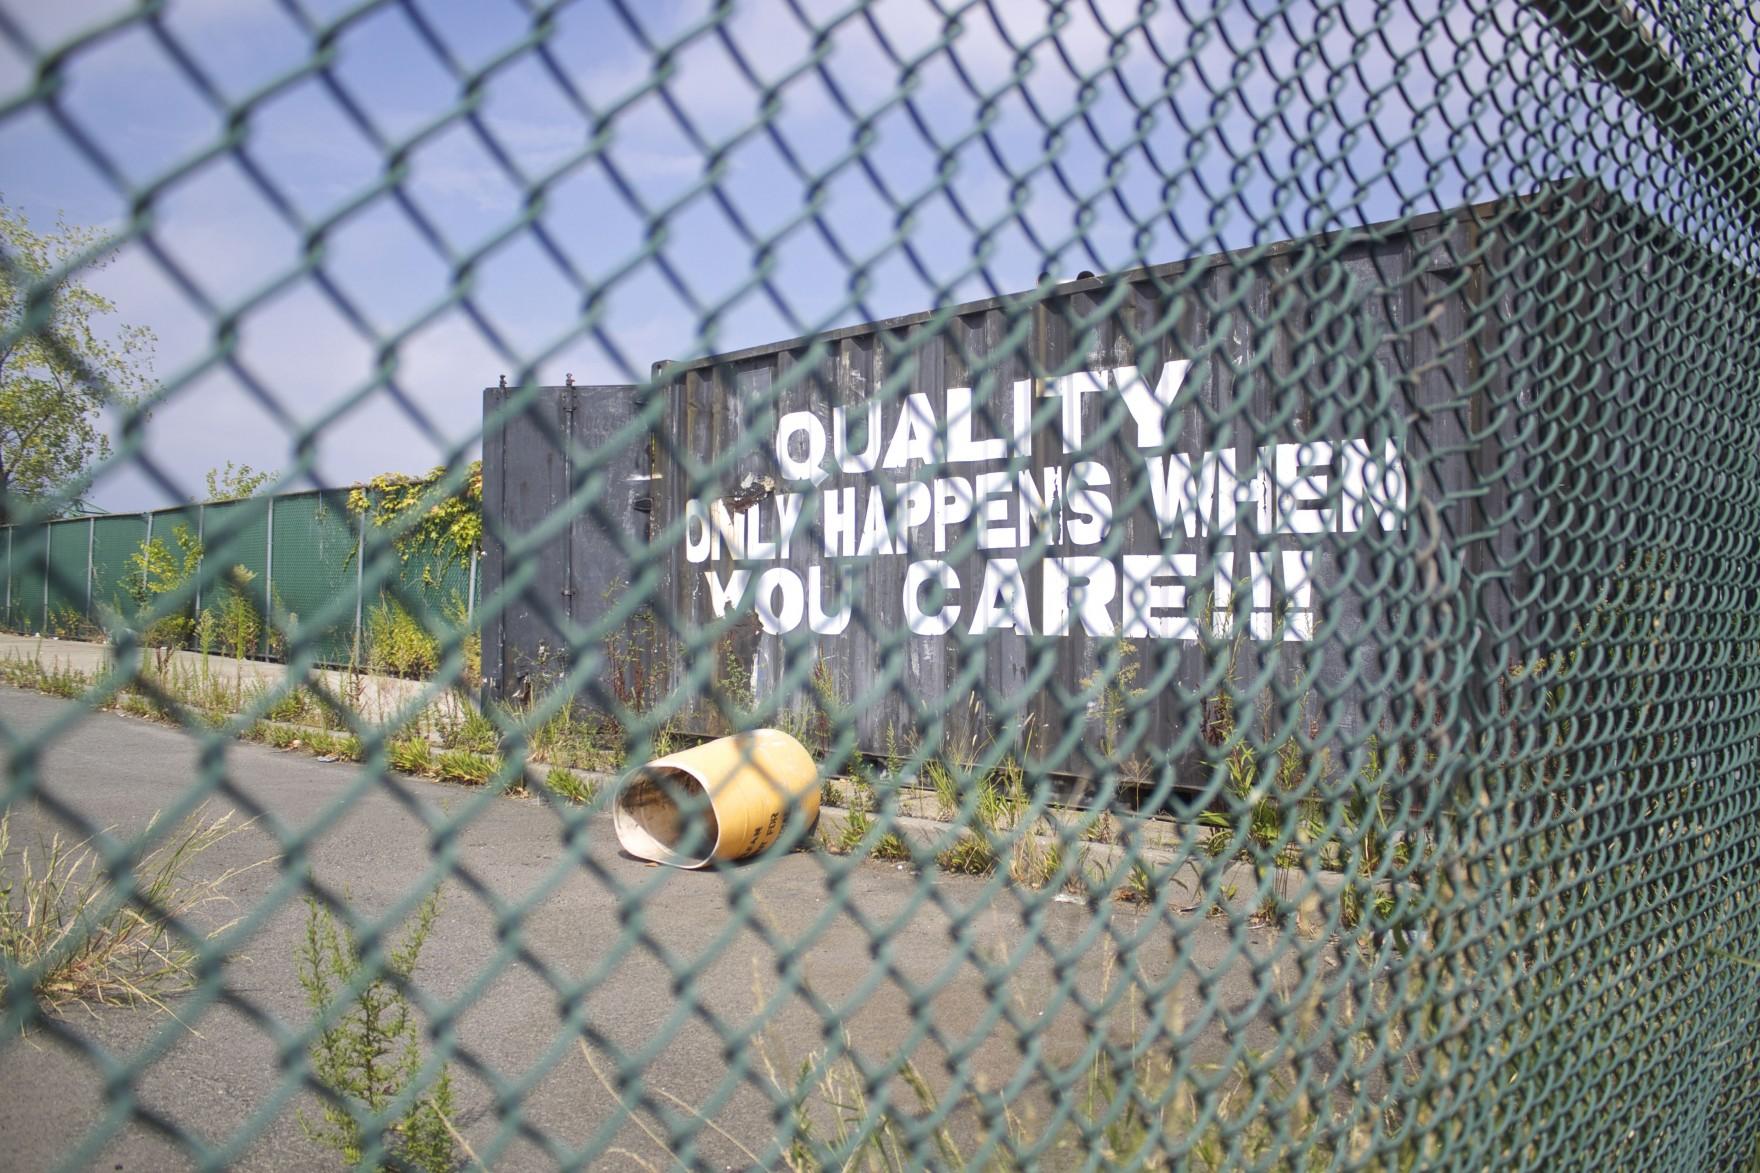 Industrial Brooklyn 11 - The Bored Vegetarian Bethany Pickard